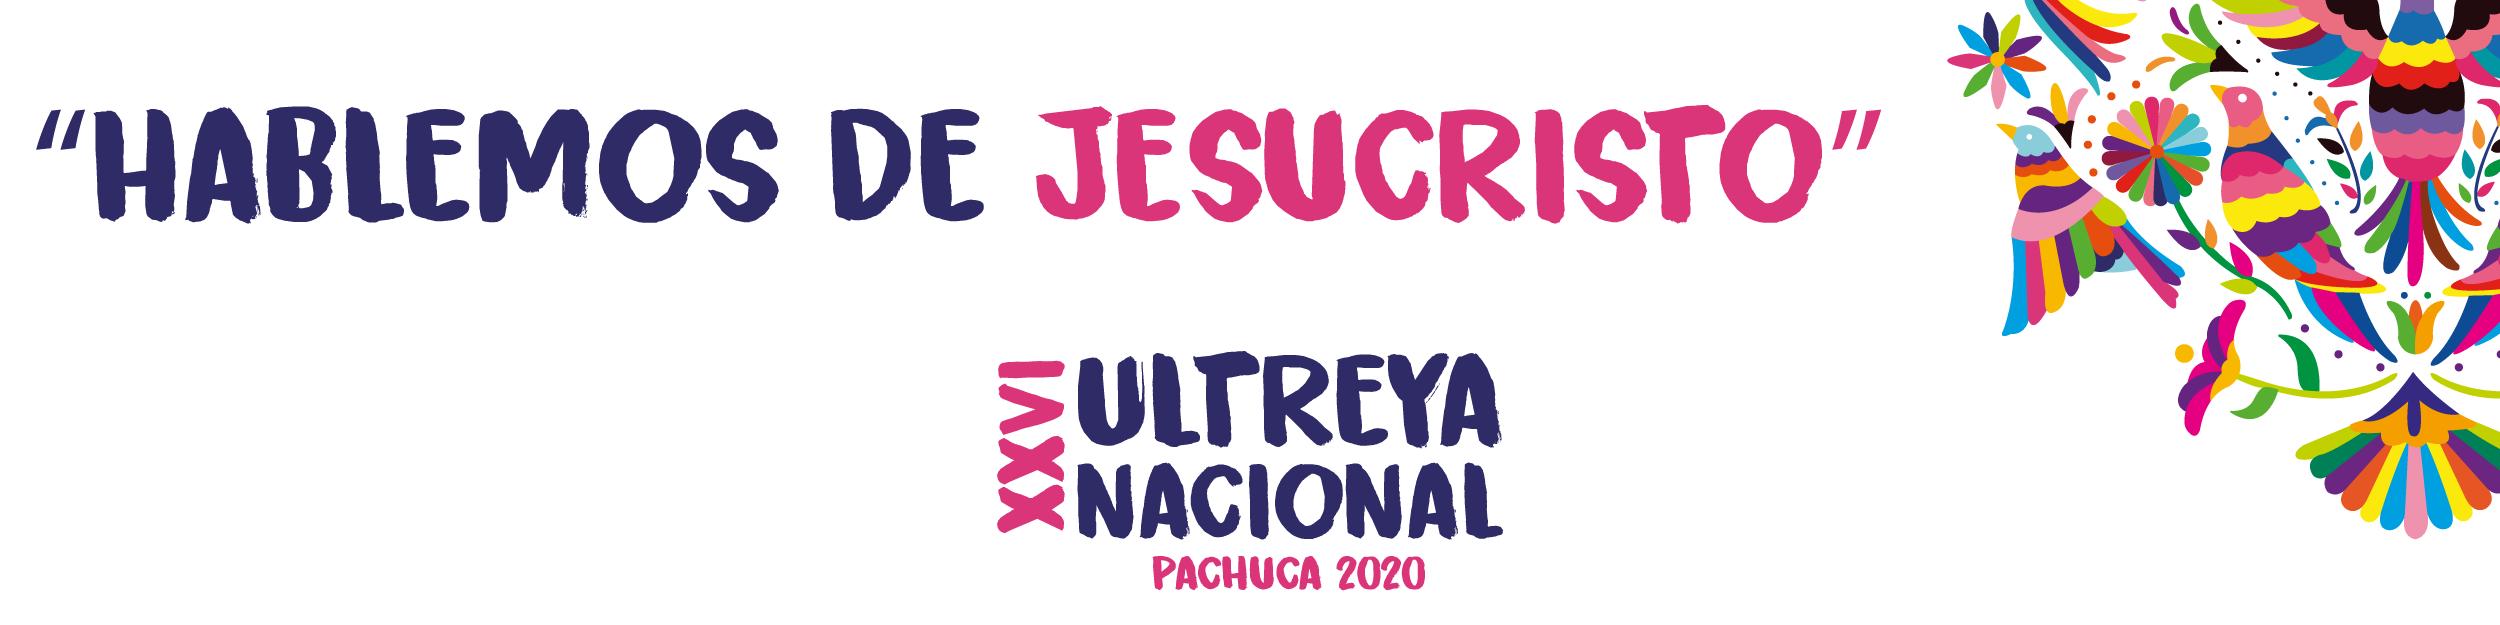 Ultreya Nacional 2020